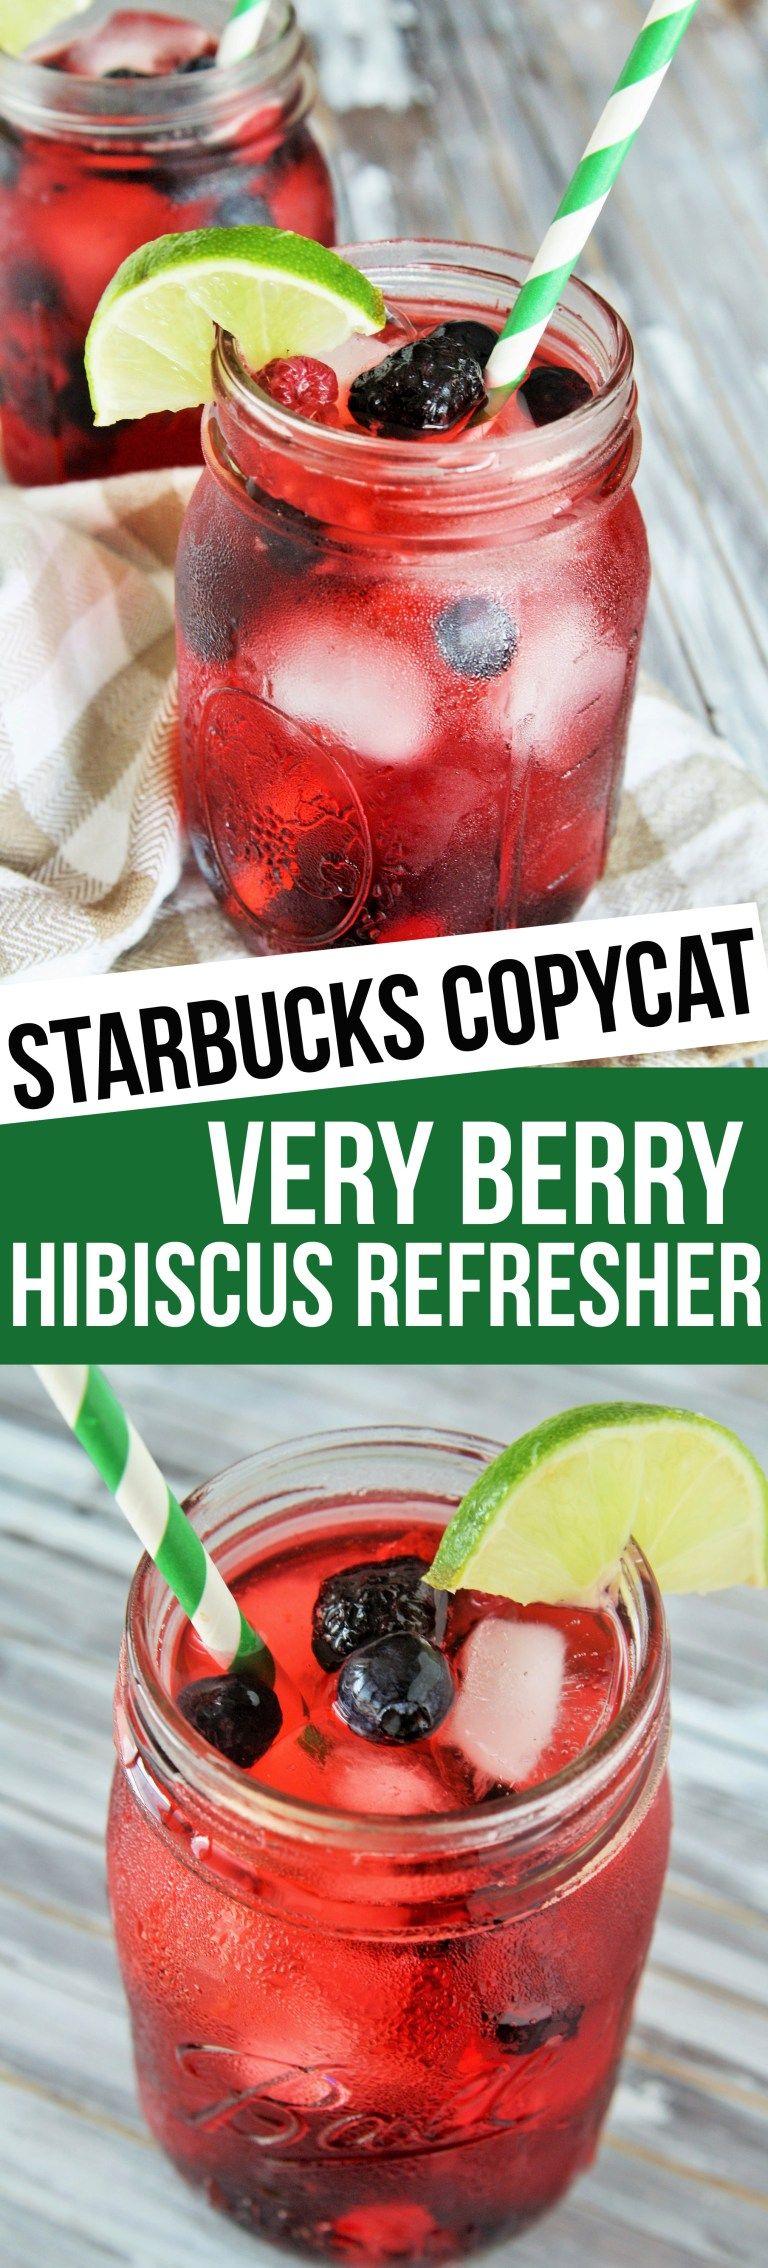 Starbucks copycat very berry hibiscus refresher recipe